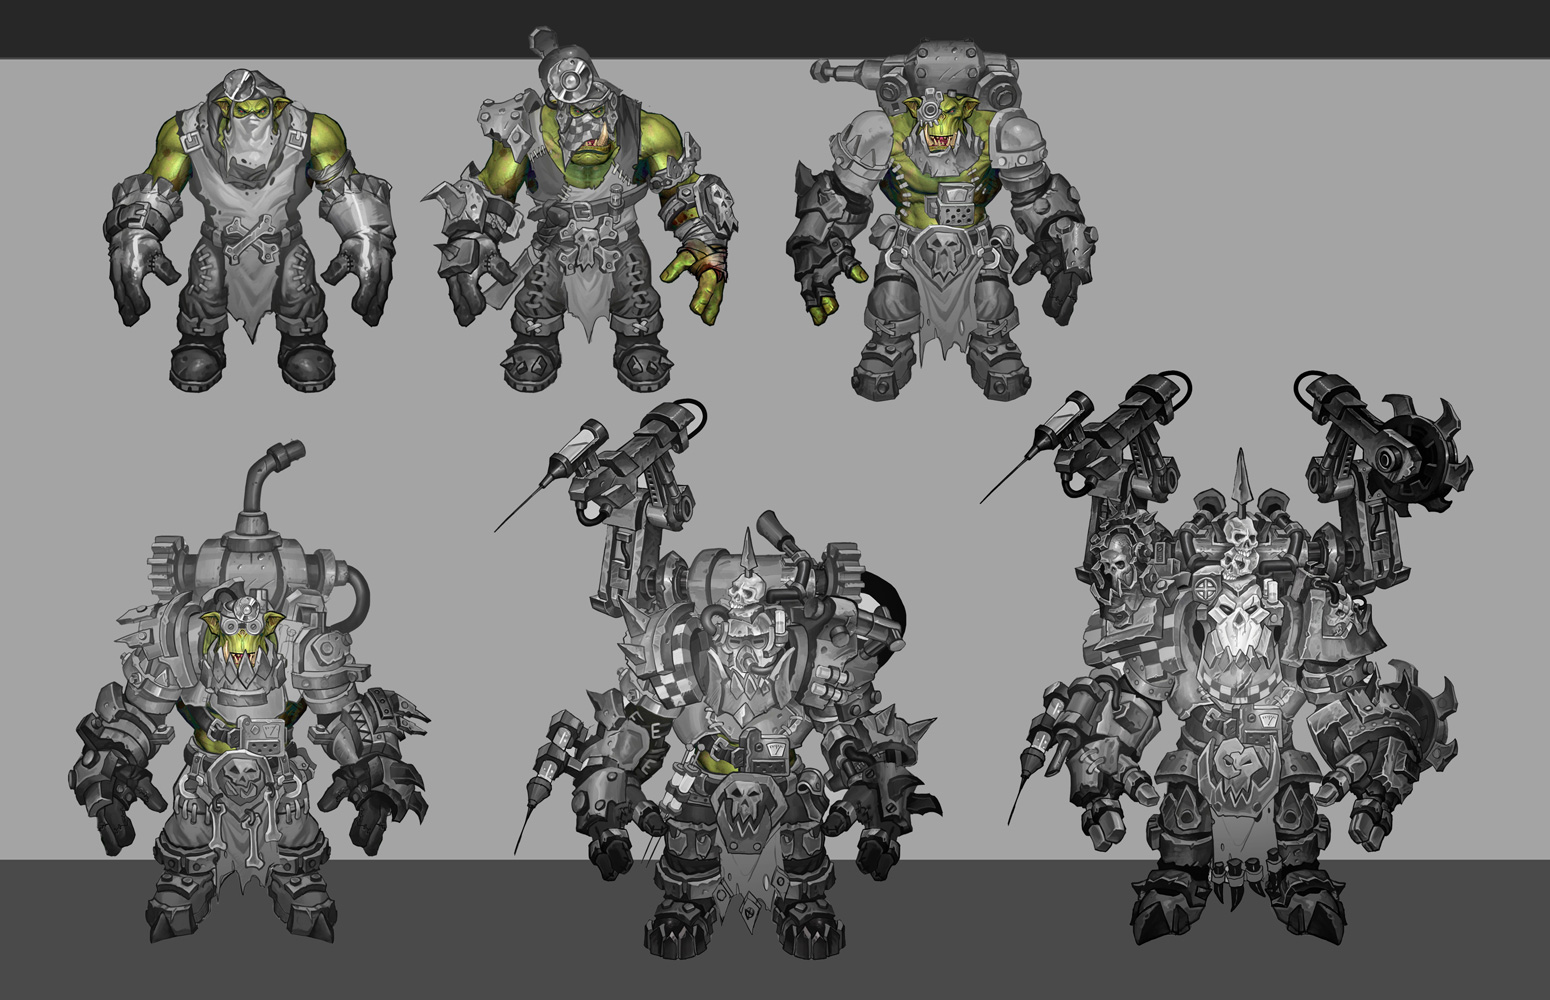 [E3] Eternal Crusade, un MMO Warhammer 40K - Page 3 17